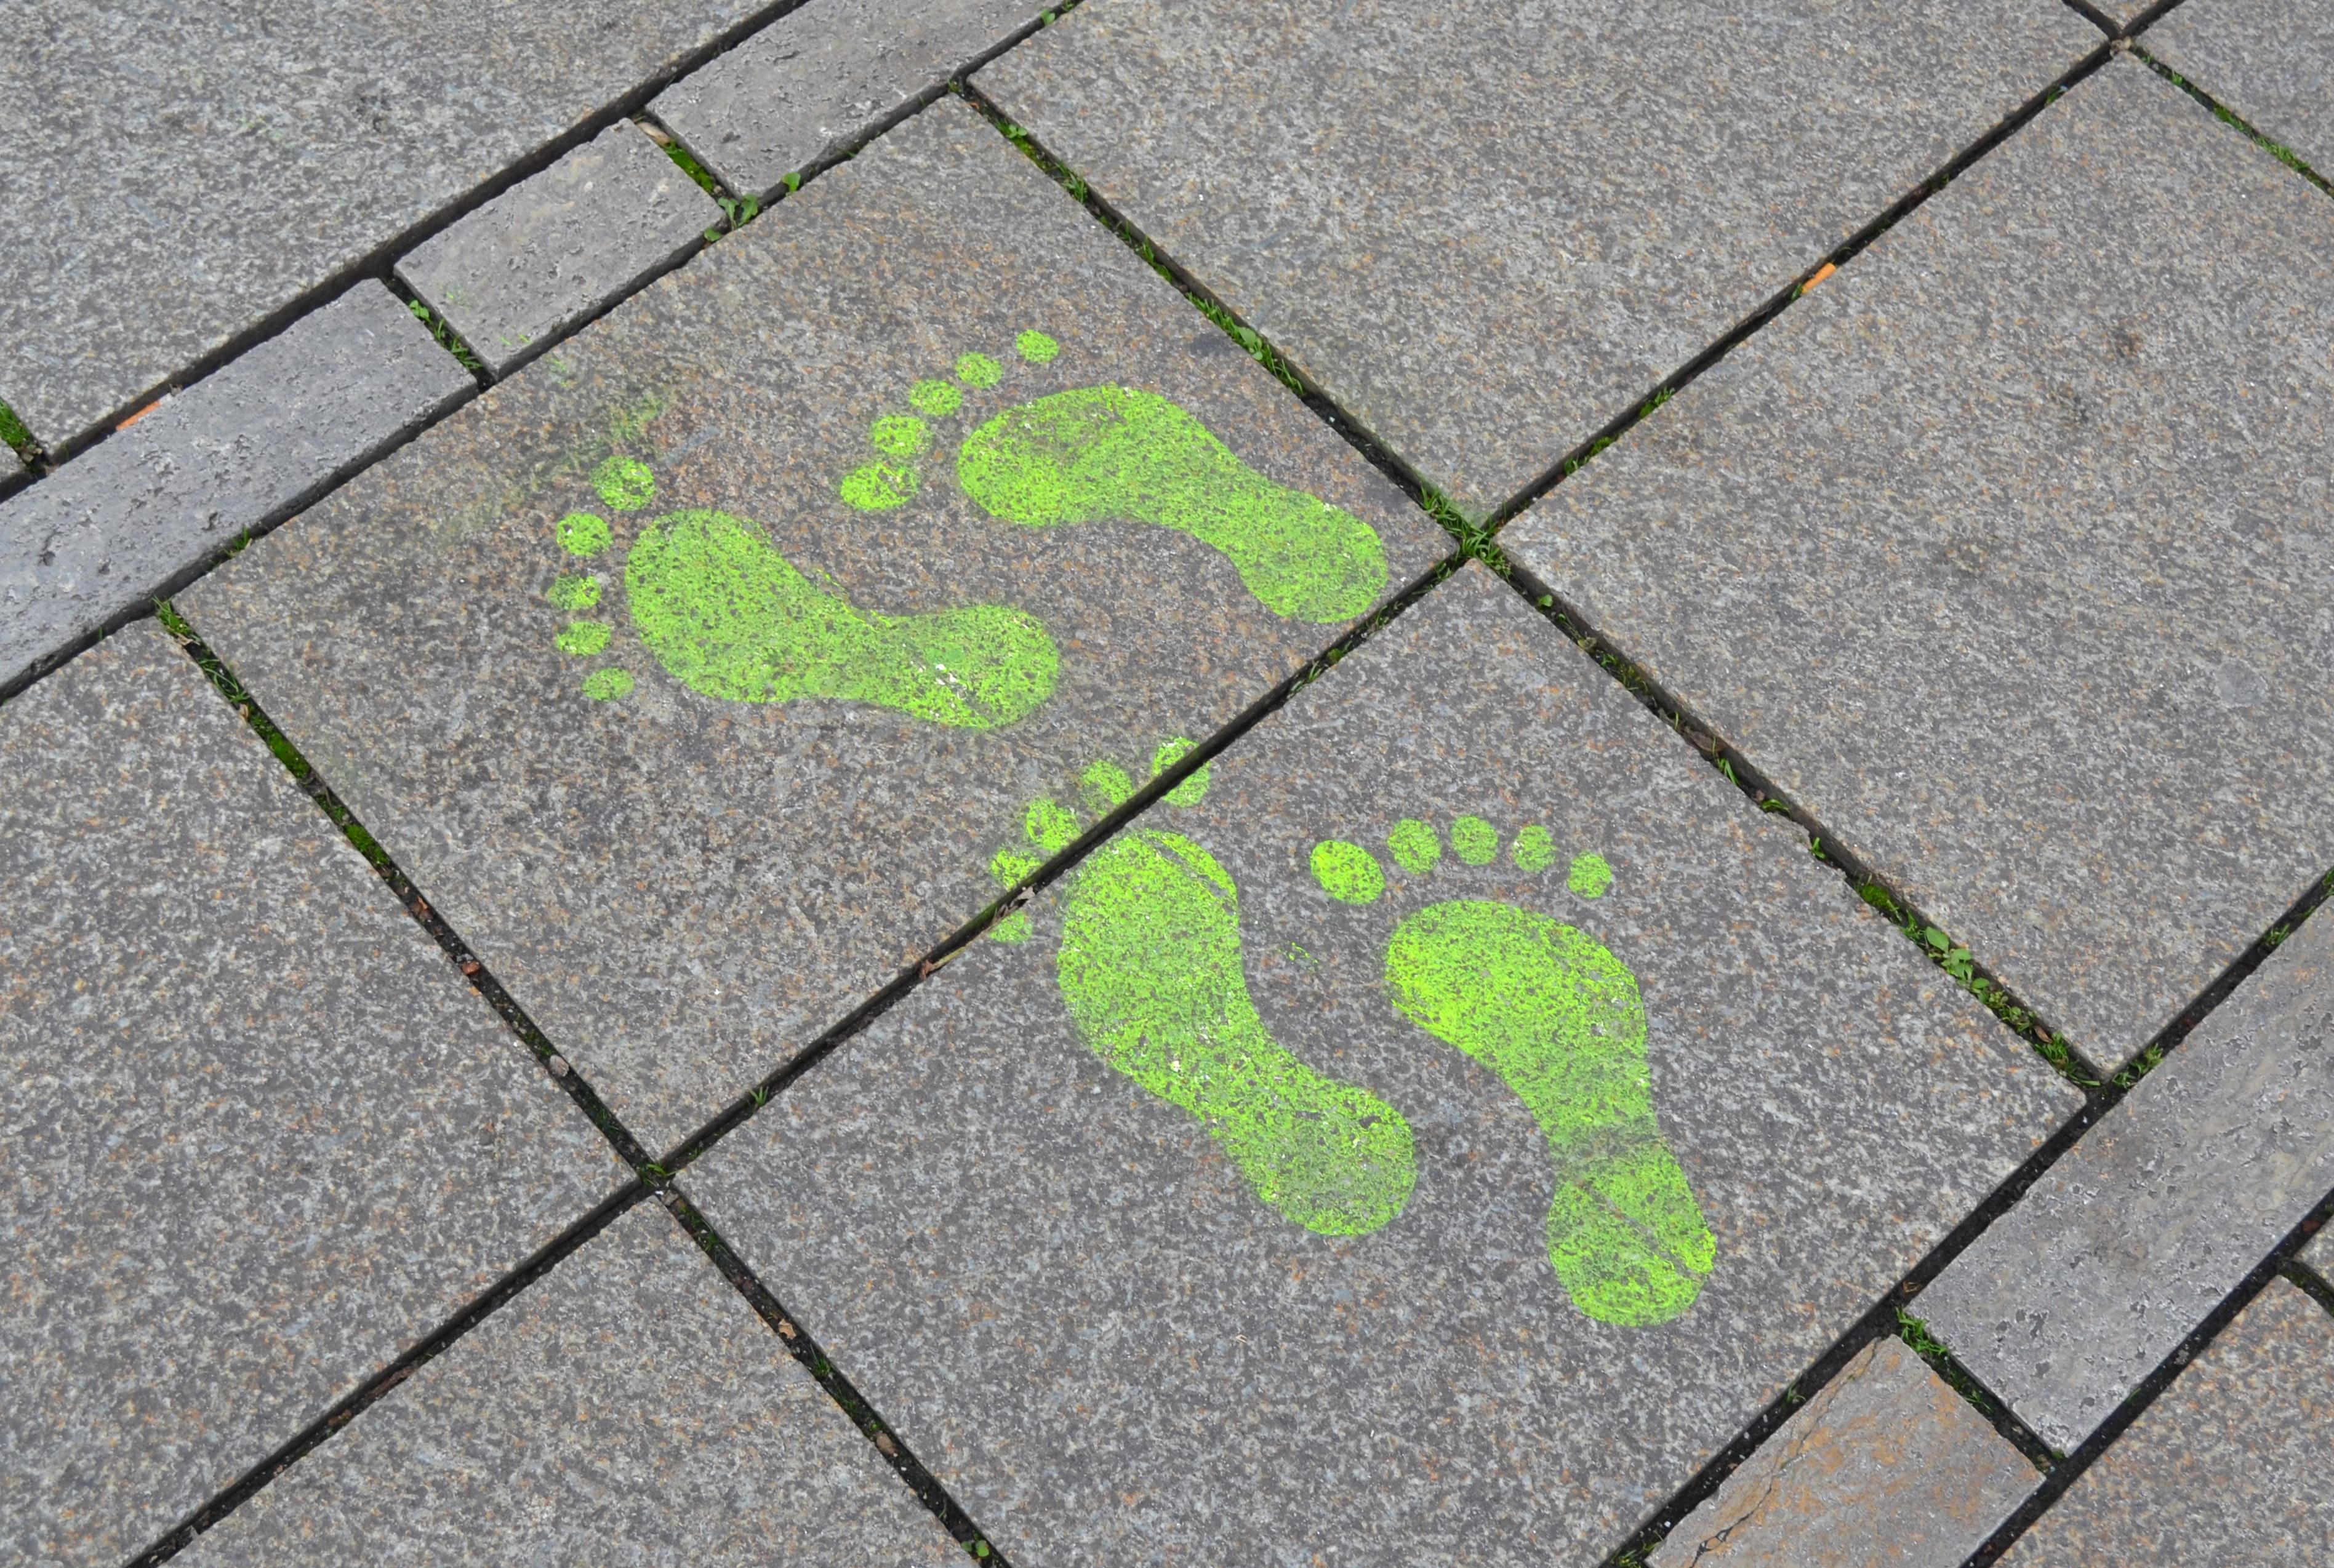 Grass Lawn Leaf Sidewalk Floor Footprint Cobblestone Wall Steps Asphalt Walkway Line Green Soil Lane Circle Street Art Flooring Road Surface Outdoor Structure on Art Steps